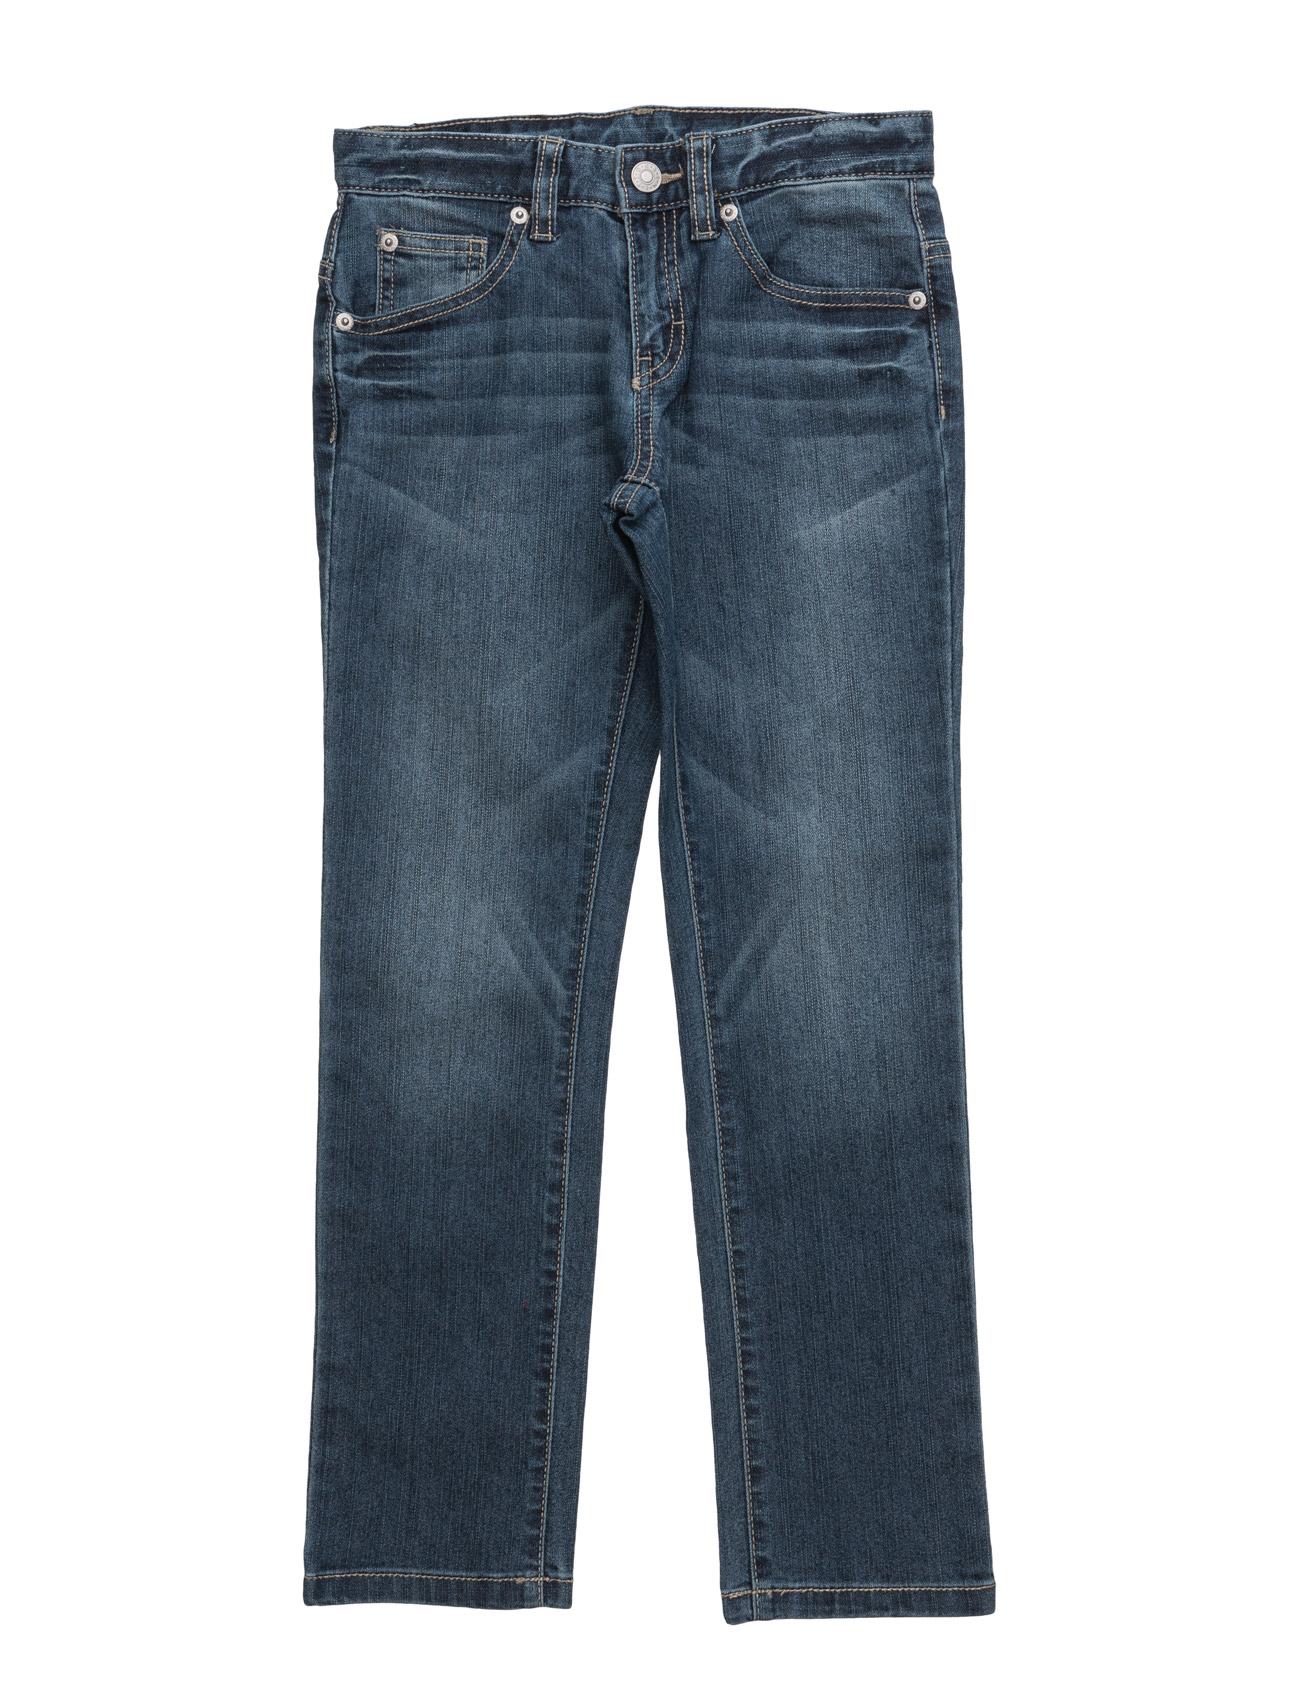 Trousers United Colors of Benetton Jeans til Drenge i